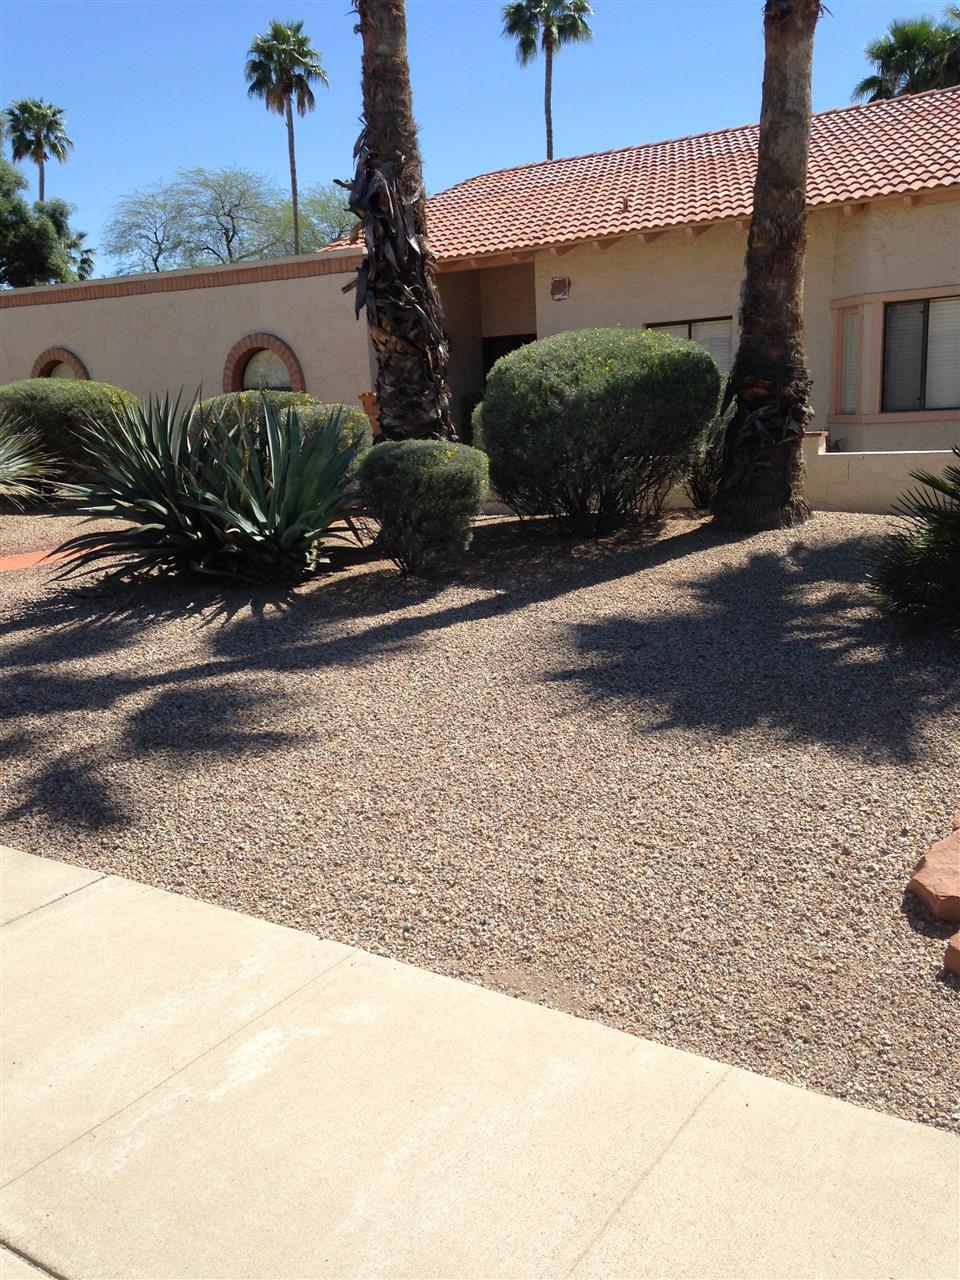 Home in Scottsdale AZ